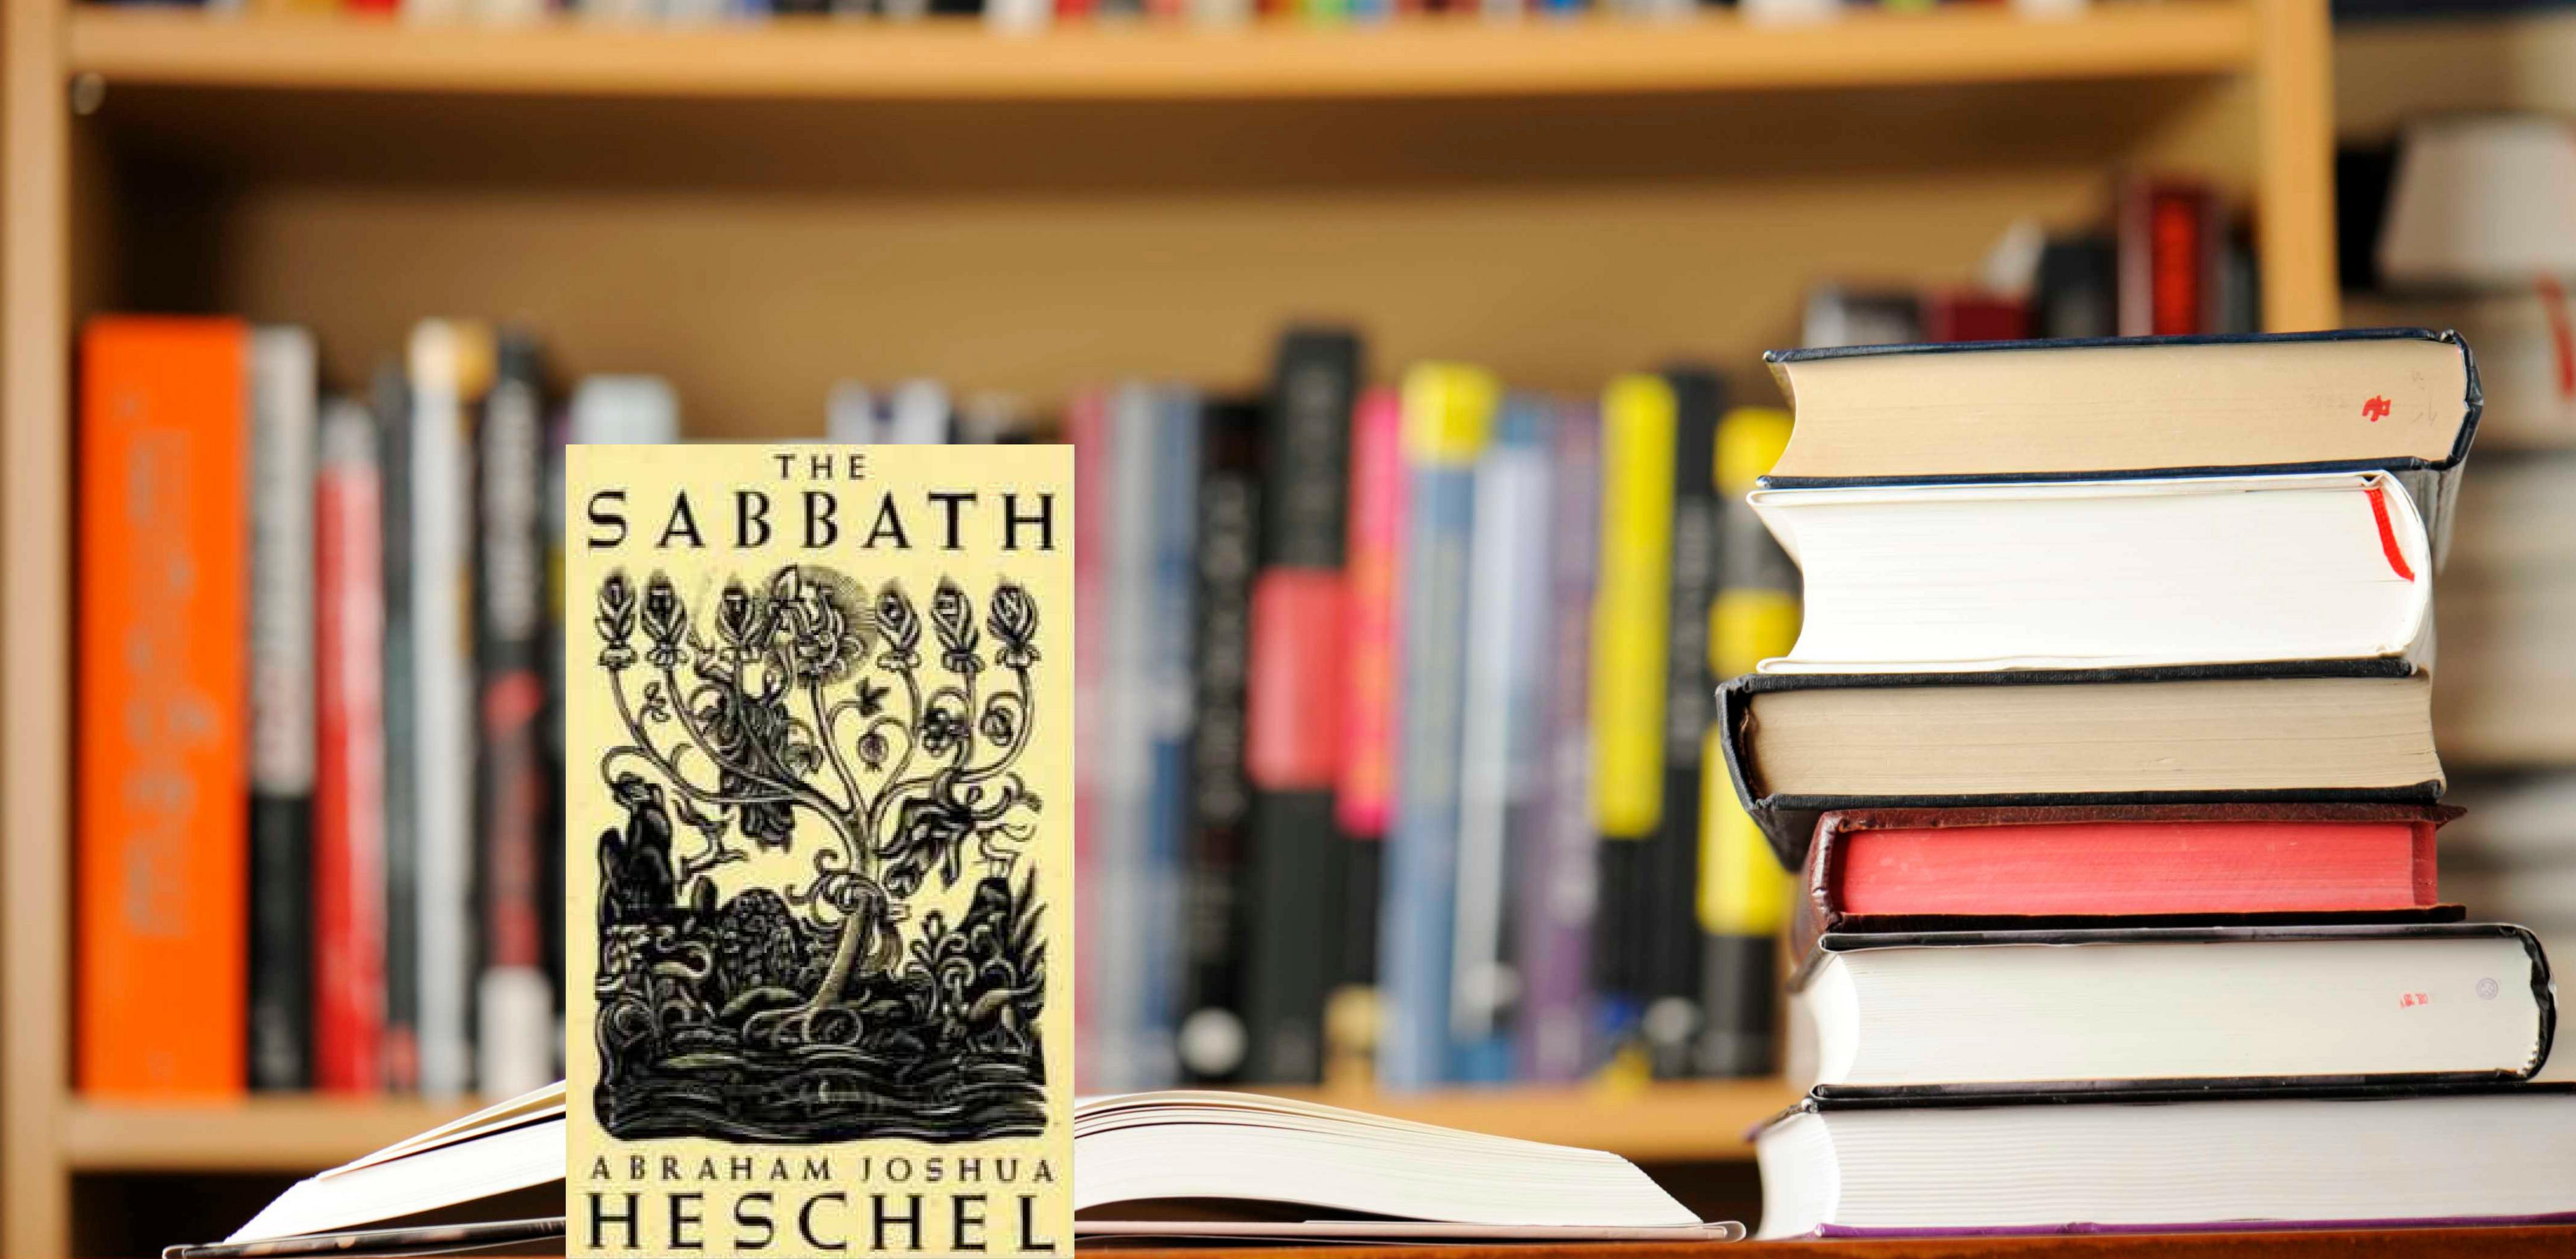 The Sabbath, by Abraham Joshua Heschel